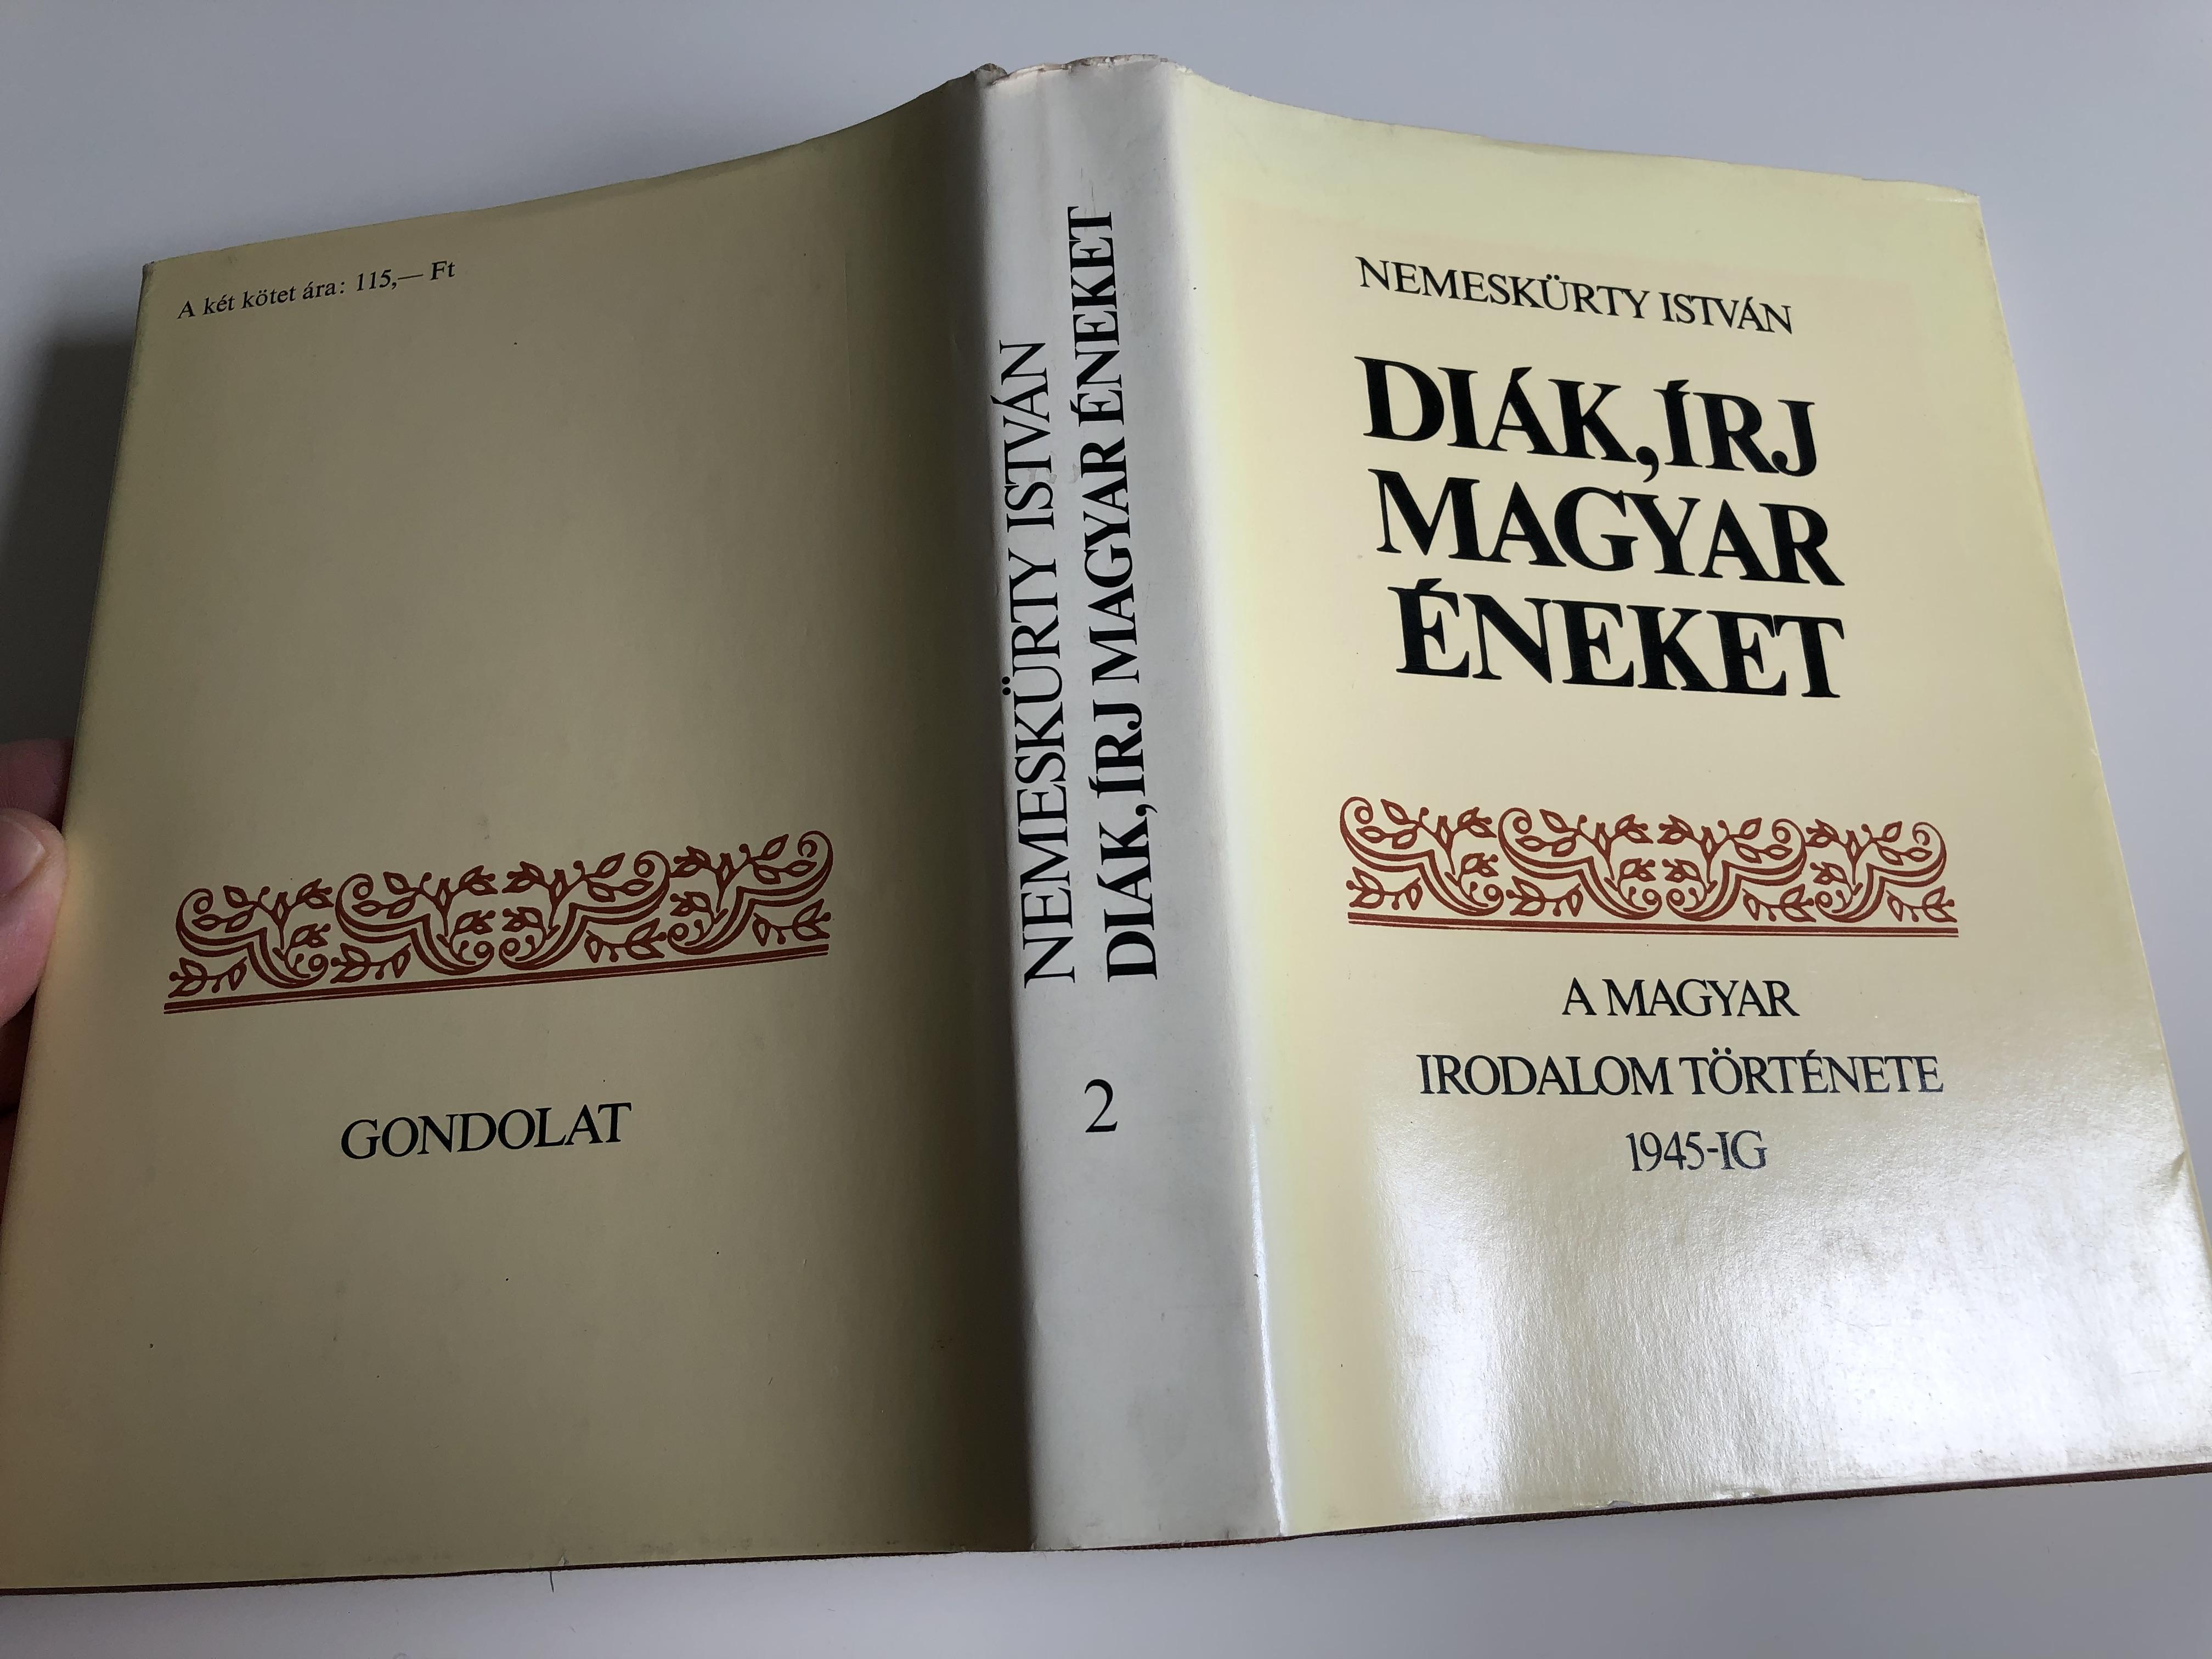 di-k-rj-magyar-neket-2-by-nemesk-rty-istv-n-a-magyar-irodalom-t-rt-nete-1945-ig-history-of-hungarian-literature-up-to-1945-volume-ii.-gondolat-1983-14-.jpg